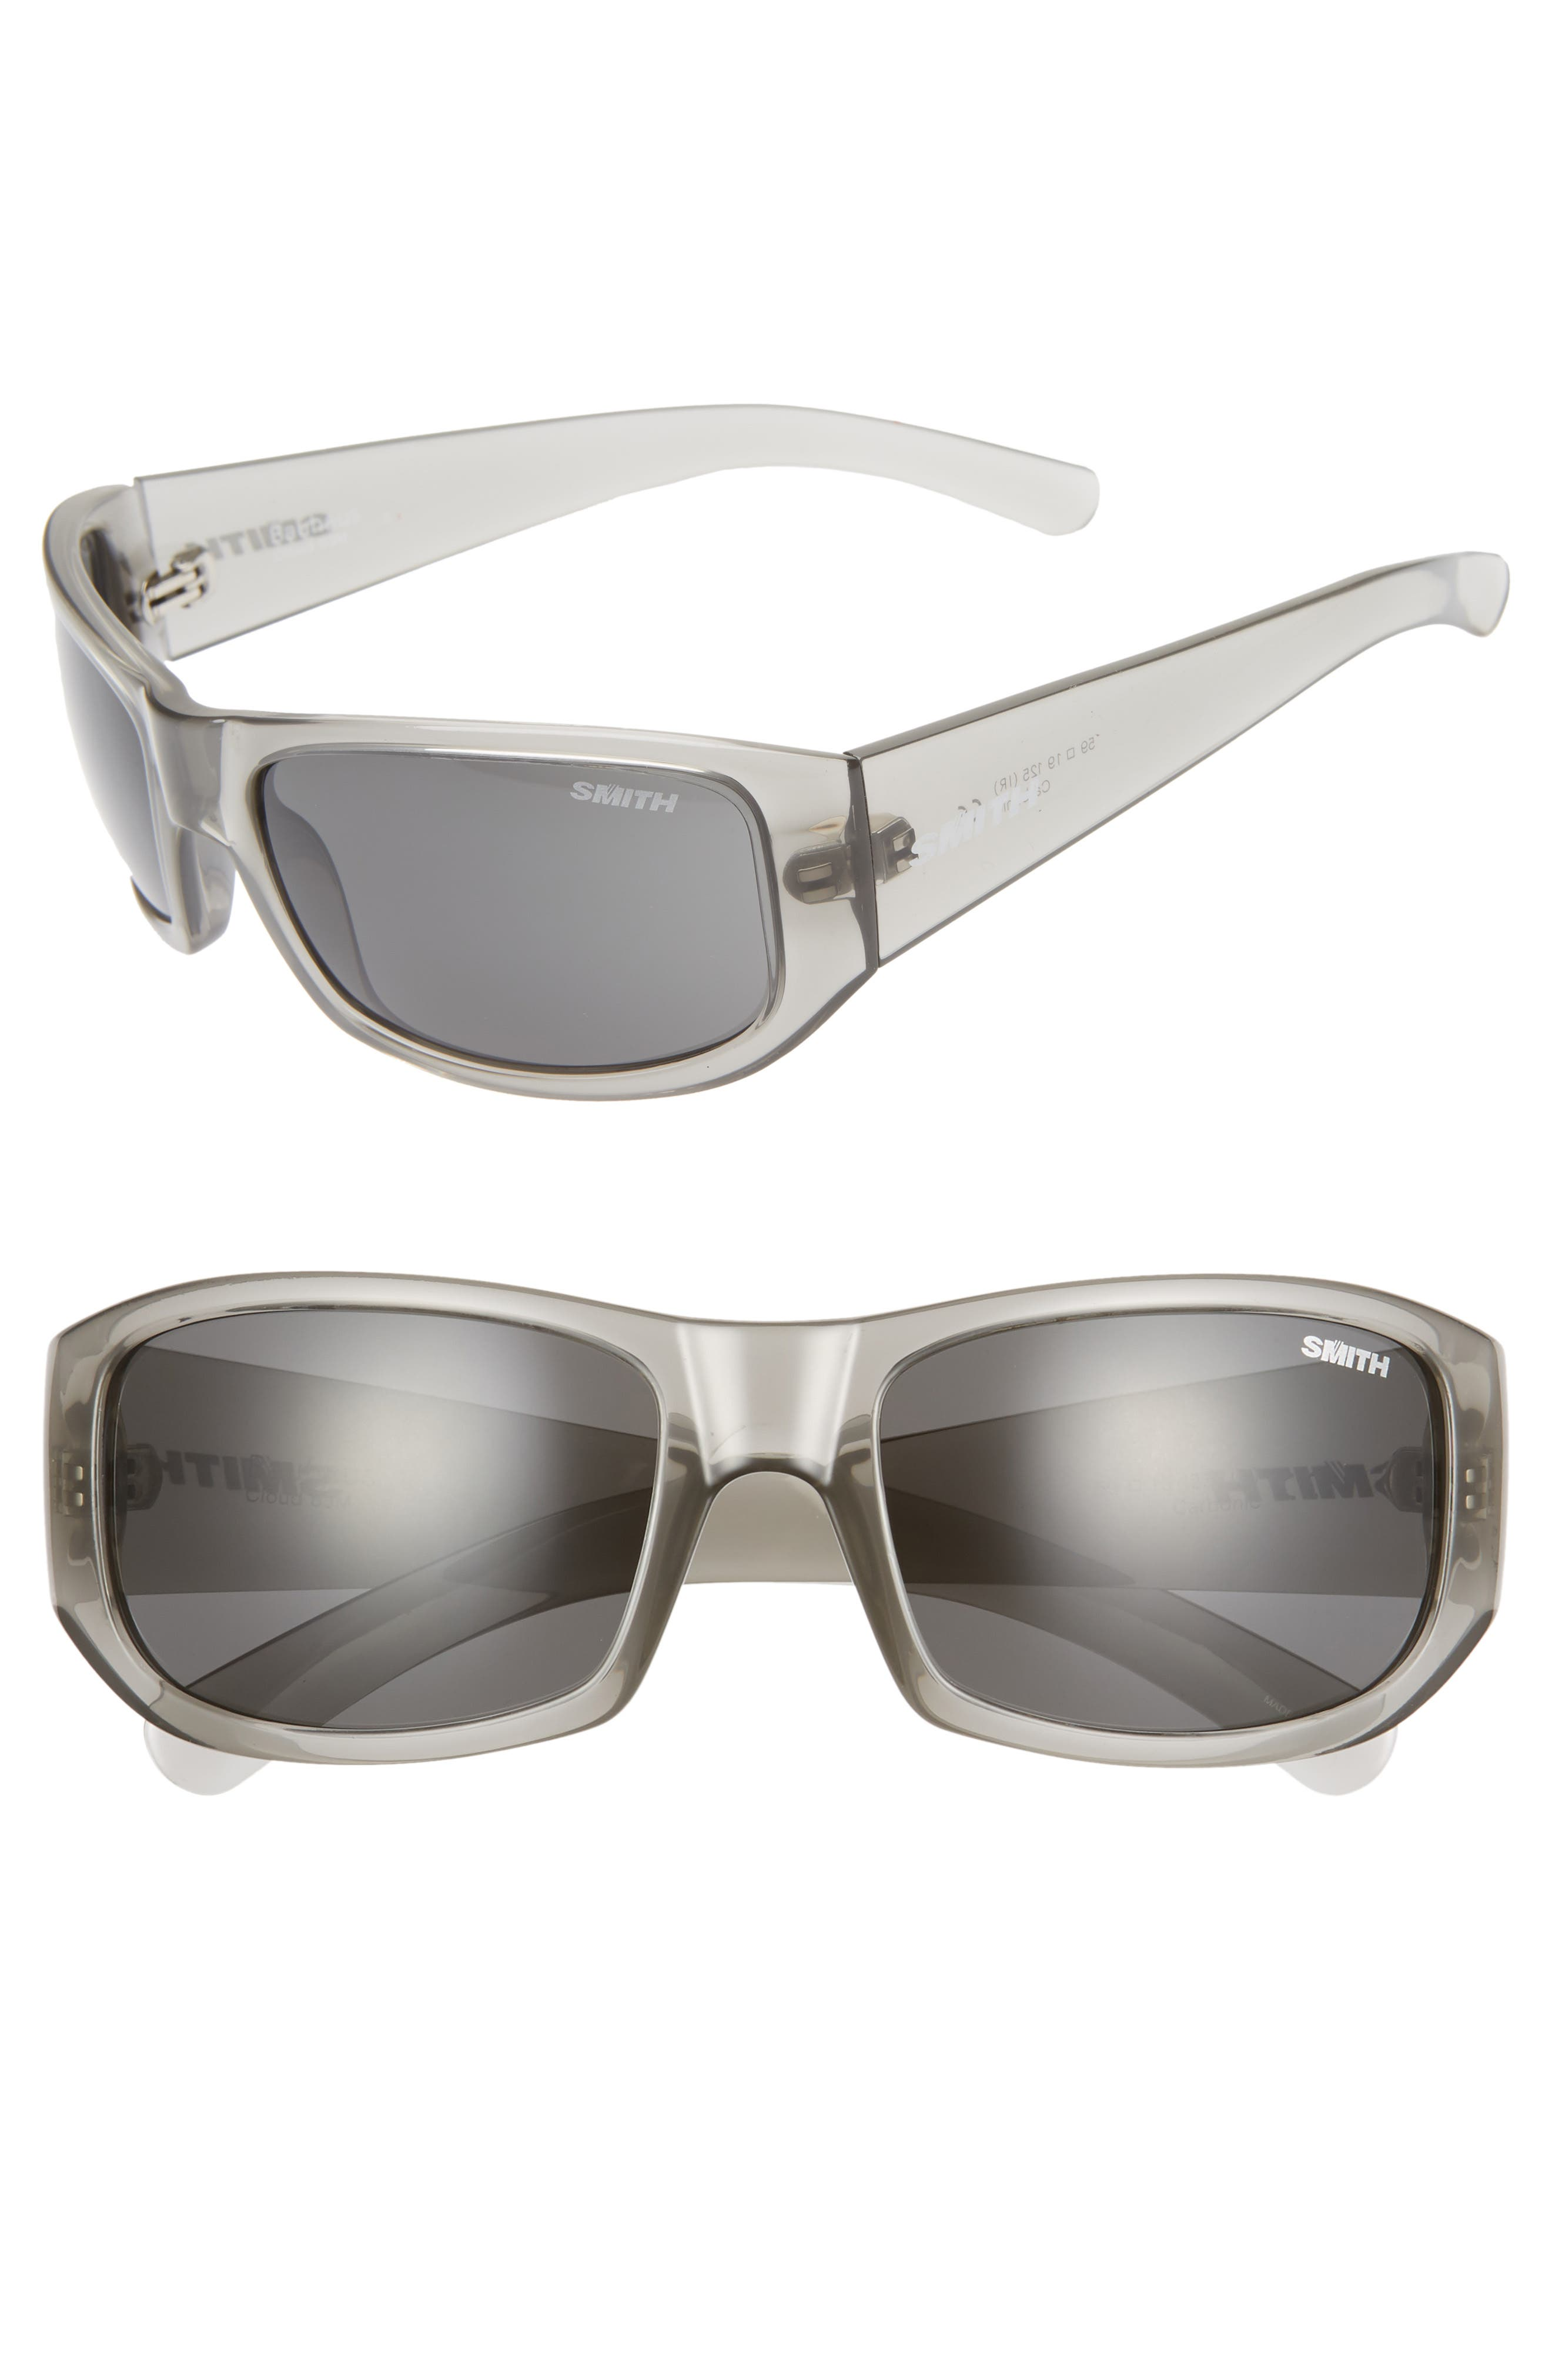 SMITH Bauhaus 59mm ChromaPop<sup>™</sup> Polarized Wraparound Sunglasses, Main, color, GREY CLOUD/ GREY